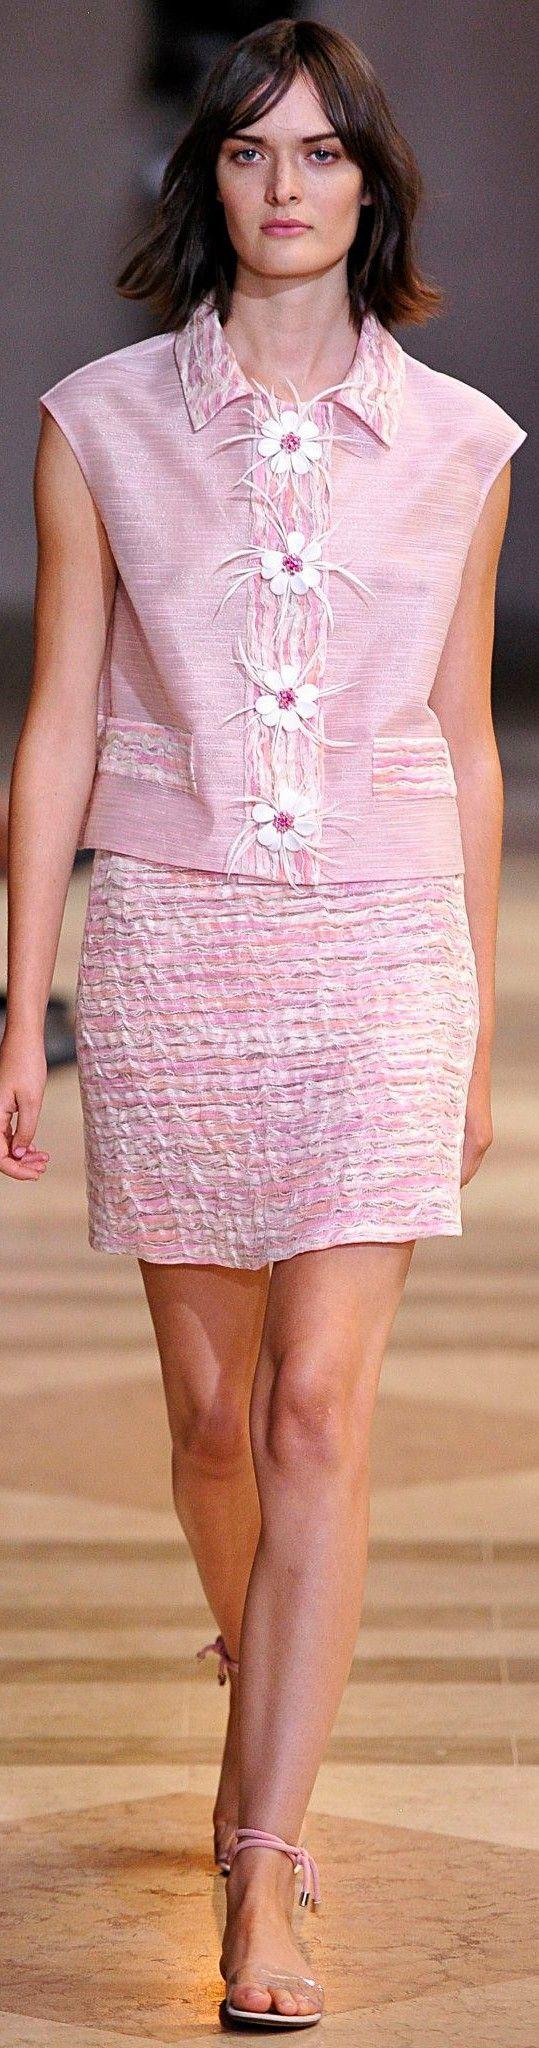 Carolina Herrera Spring 2016 women fashion outfit clothing style apparel @roressclothes closet ideas